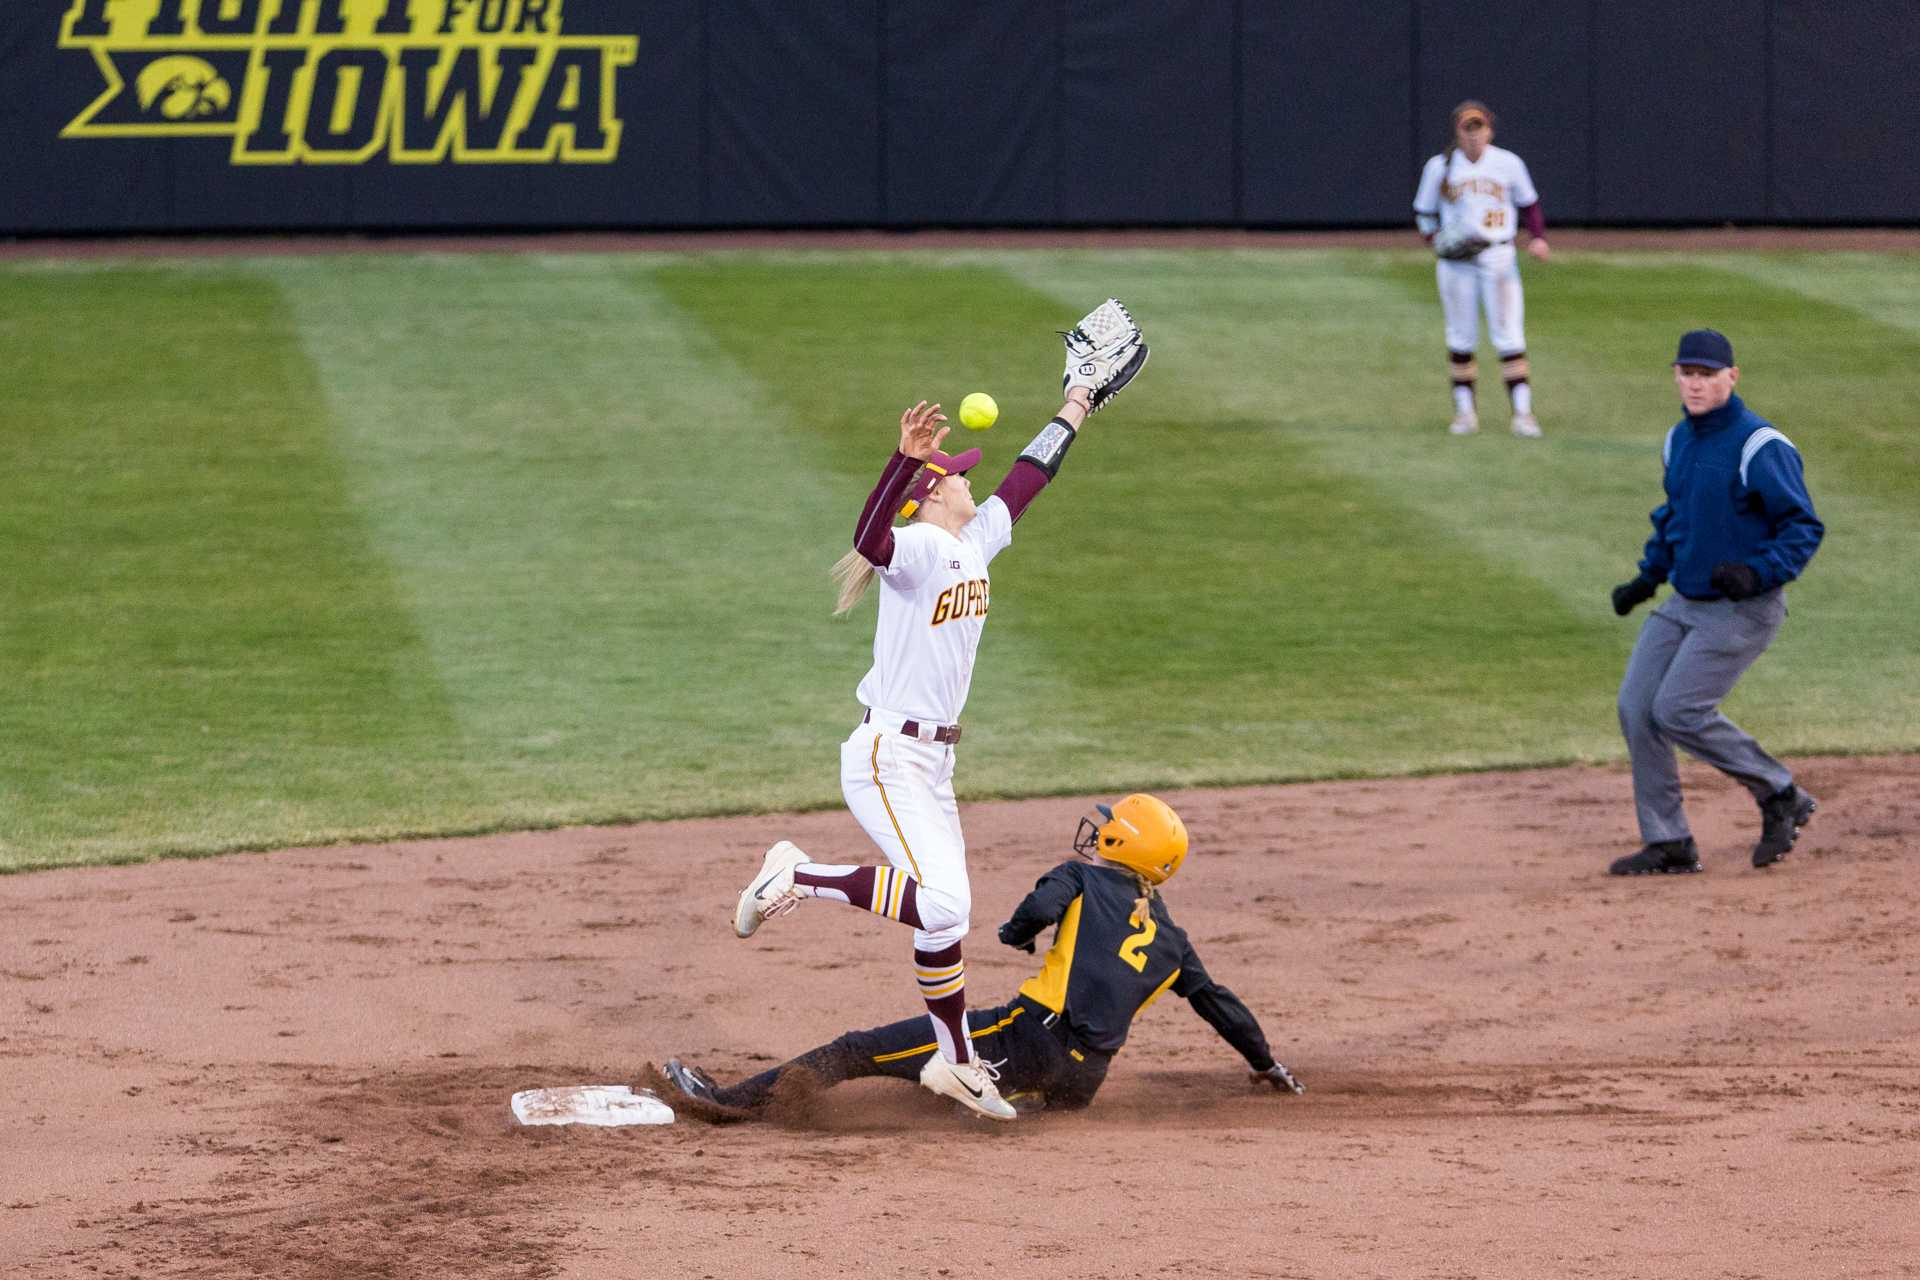 Photos: Softball vs Minnesota game 2